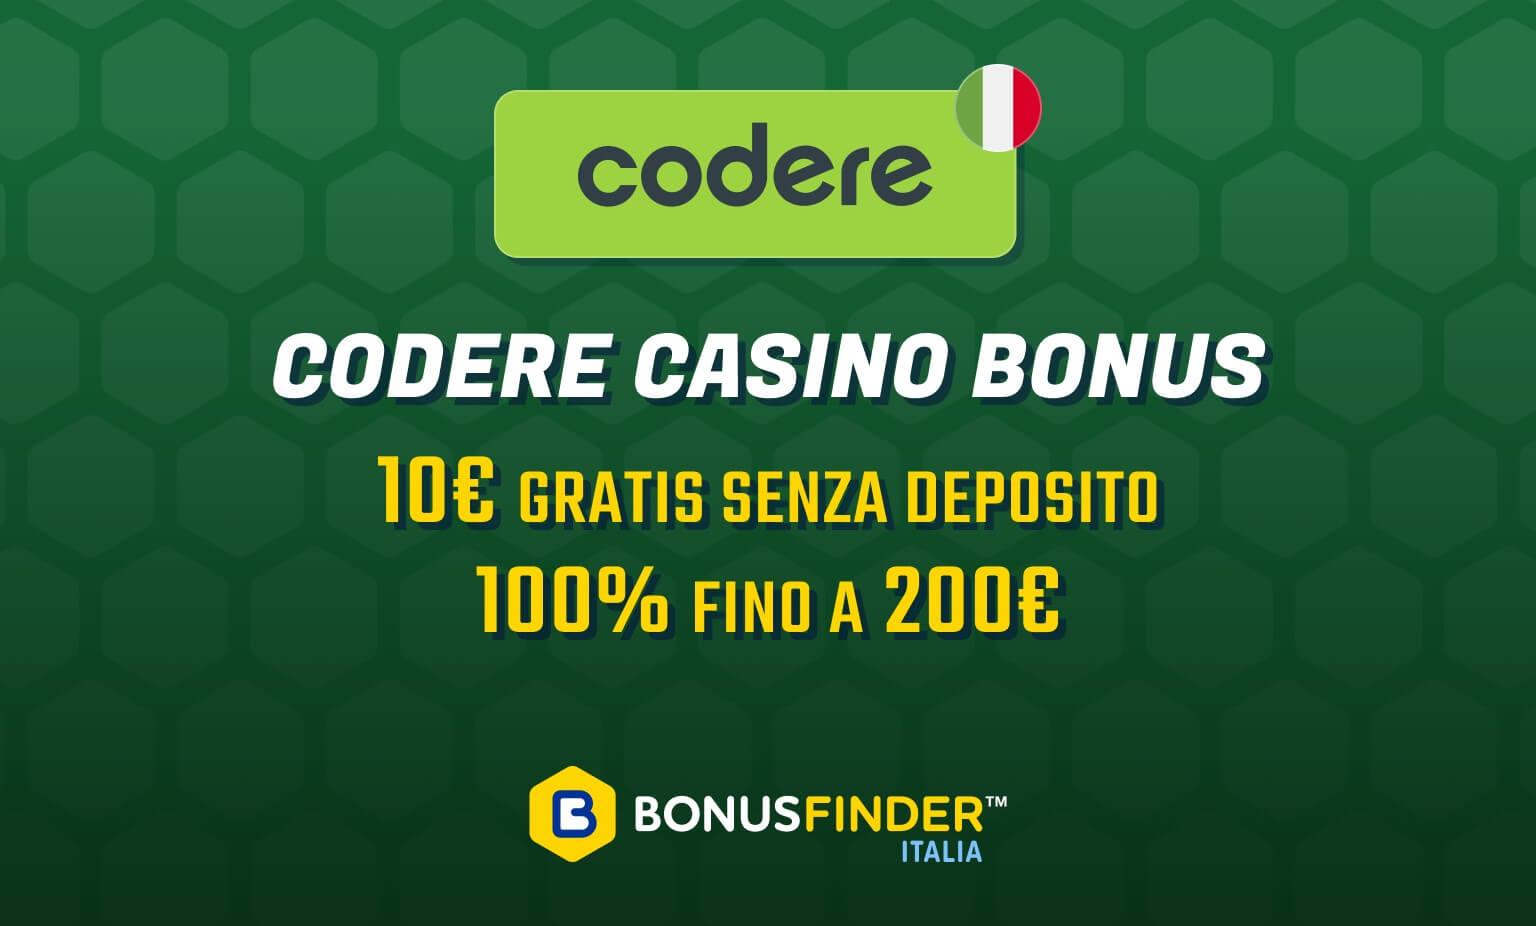 codere casino bonus benvenuto